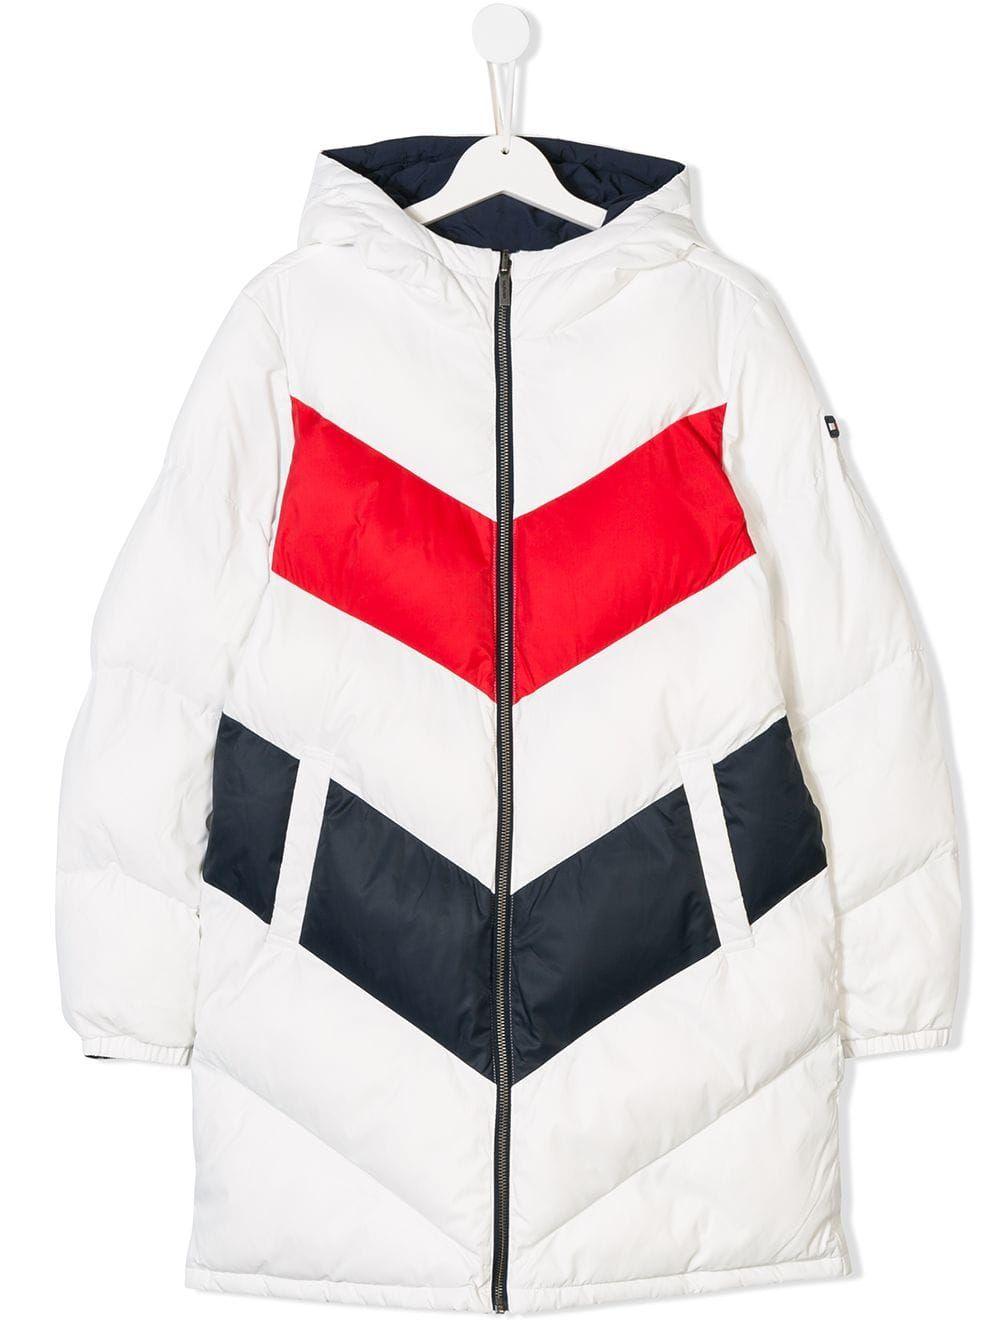 45fa07f3 Tommy Hilfiger Junior TEEN reversible colour blocked coat | Kids ...